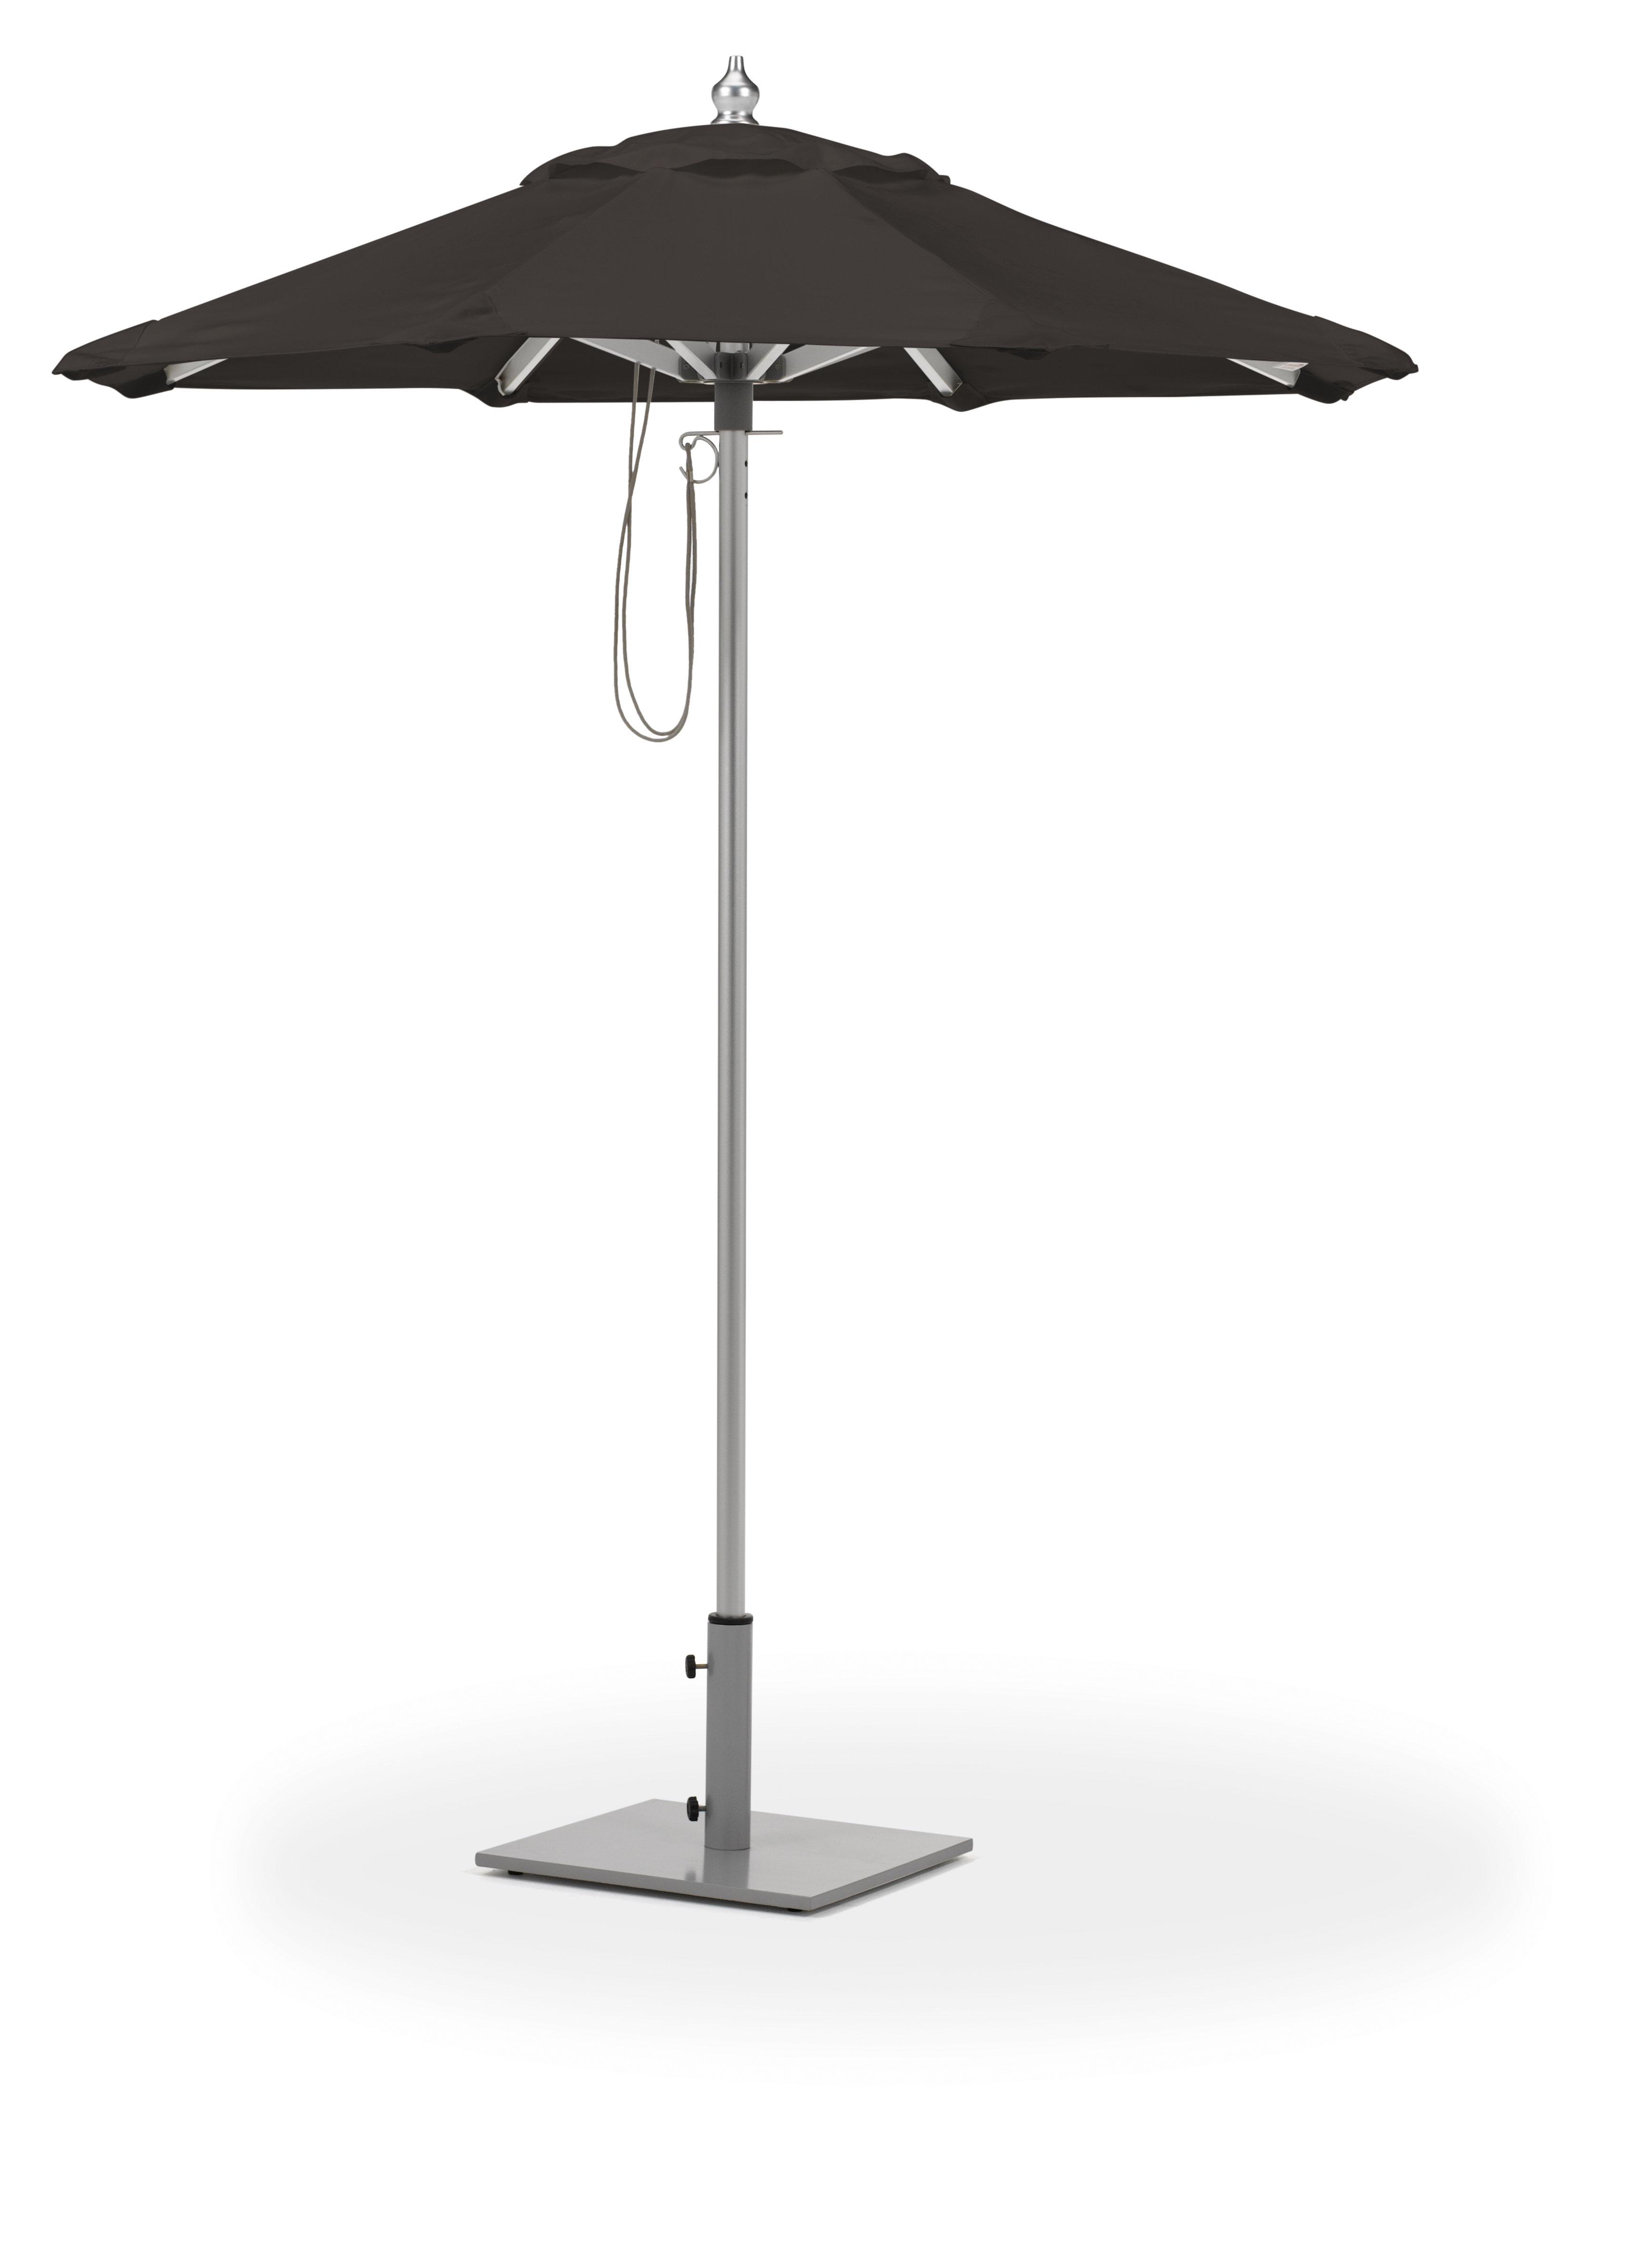 Caravelle Market Umbrellas Throughout 2020 Stambaugh 6' Market Umbrella (View 10 of 20)